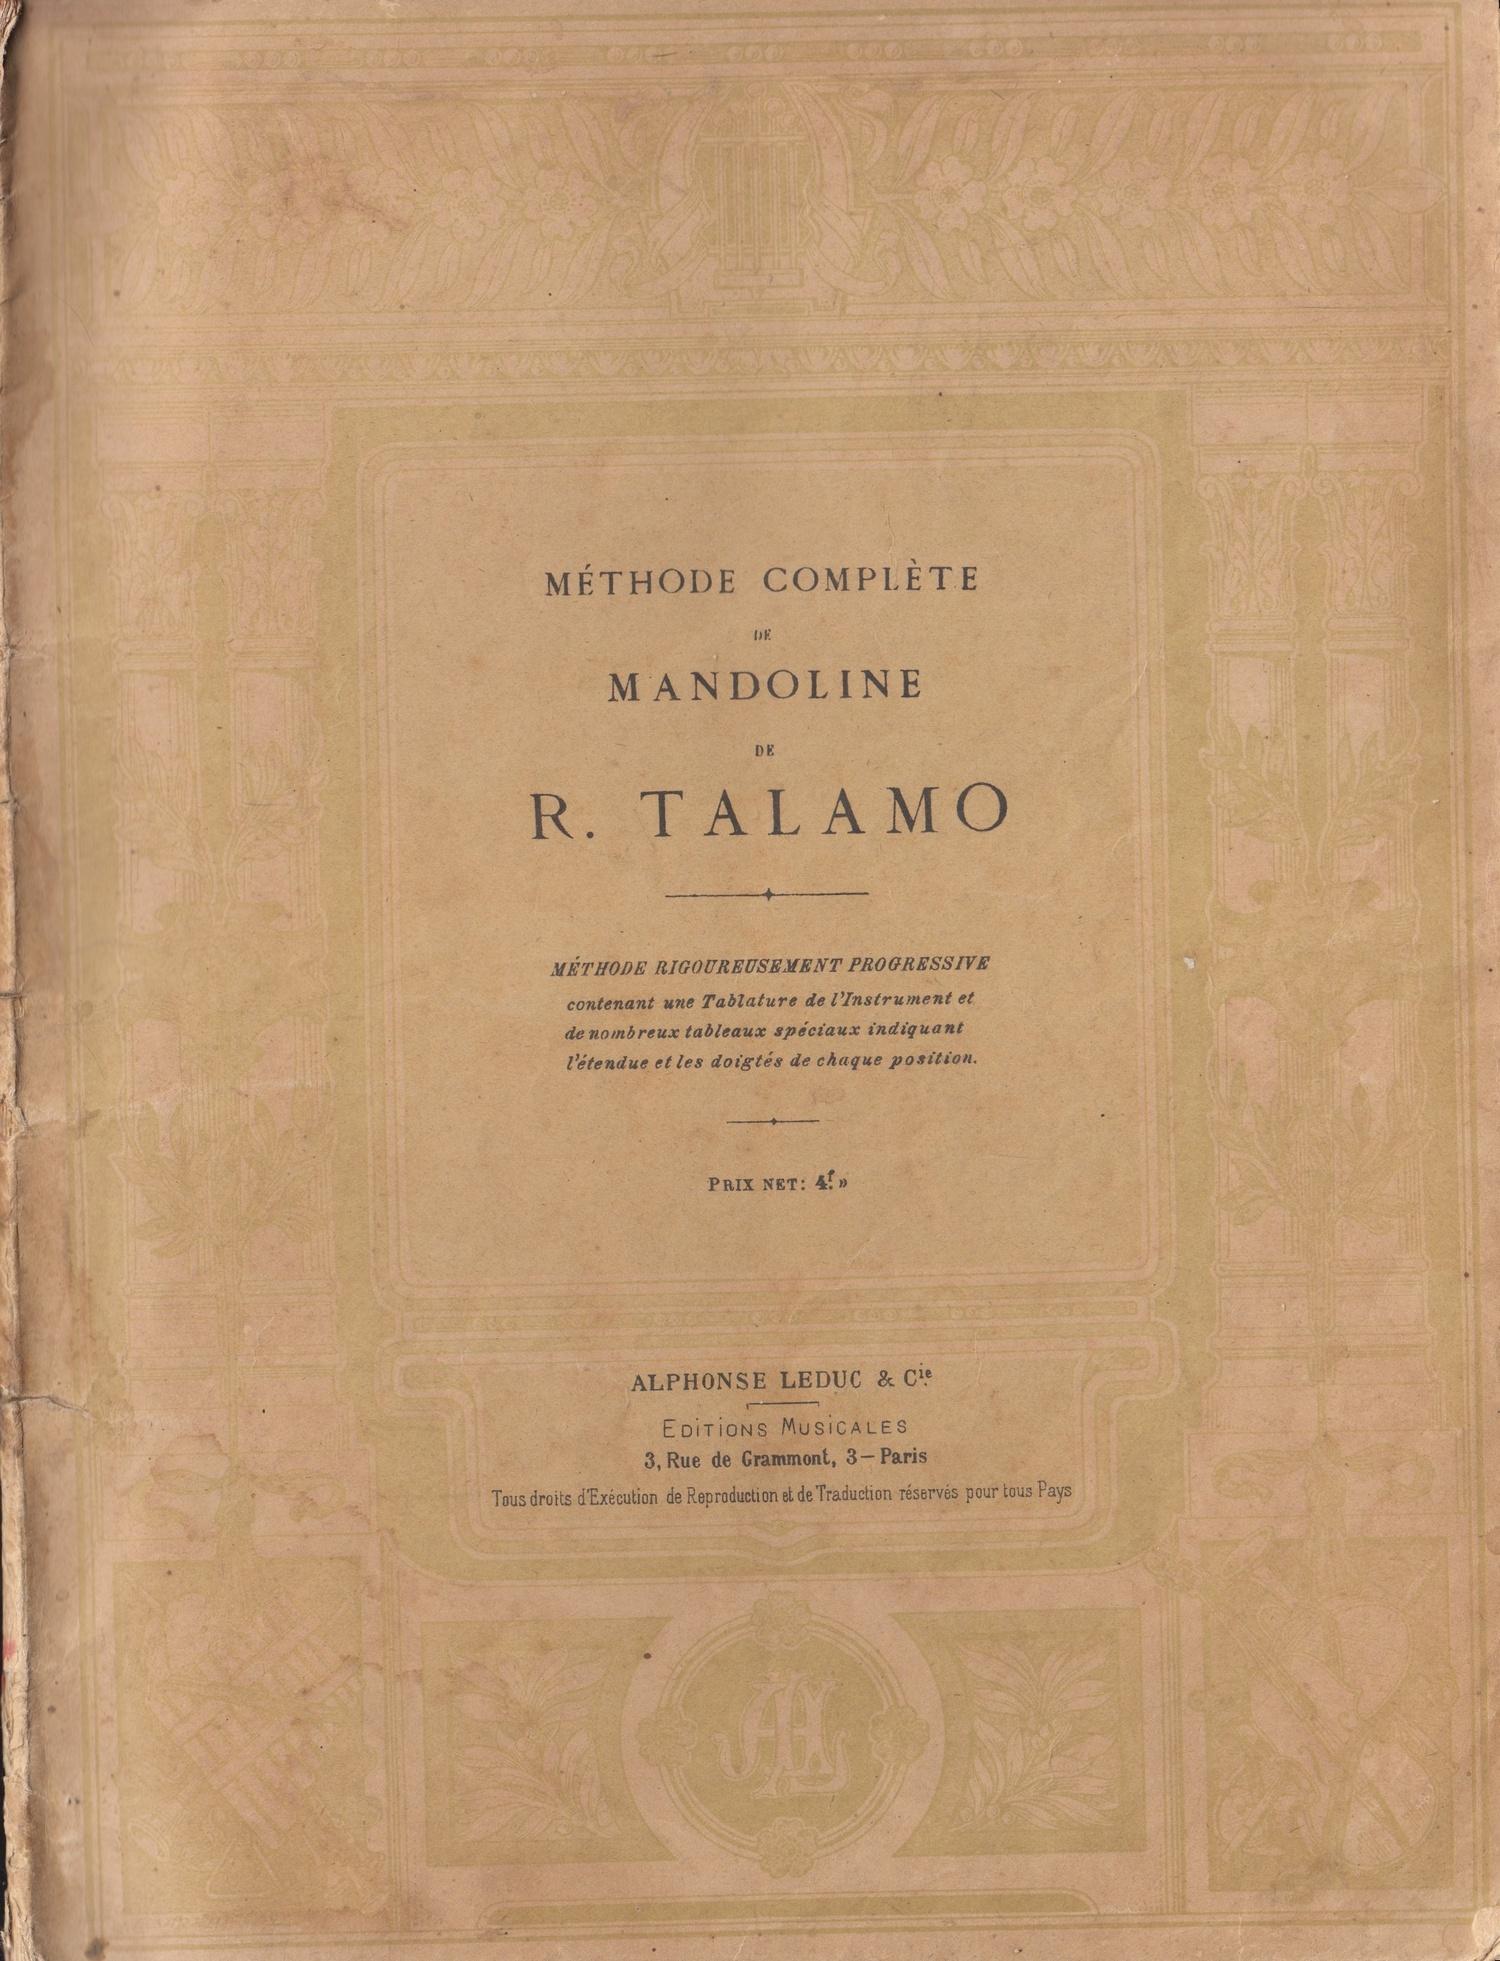 Mandolinenschule Raphael Talamo (1907)